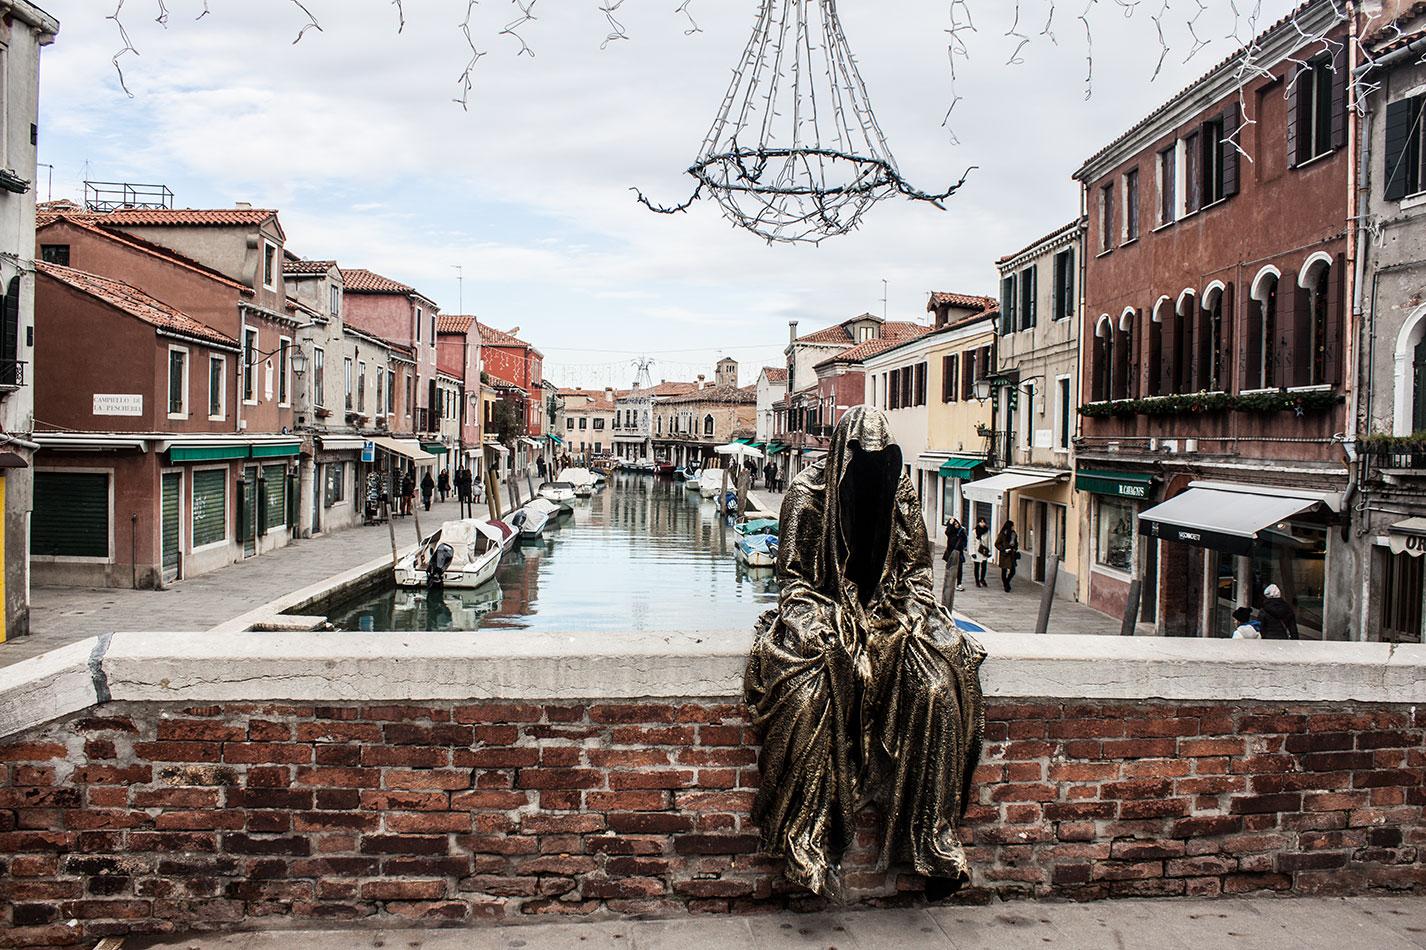 Italia-Venice-Murano-Berengo-glas-studio-glasstress-guardians-of-time-by-Manfred-Kili-Kielnhofer-contemporary-art-design-show-7162